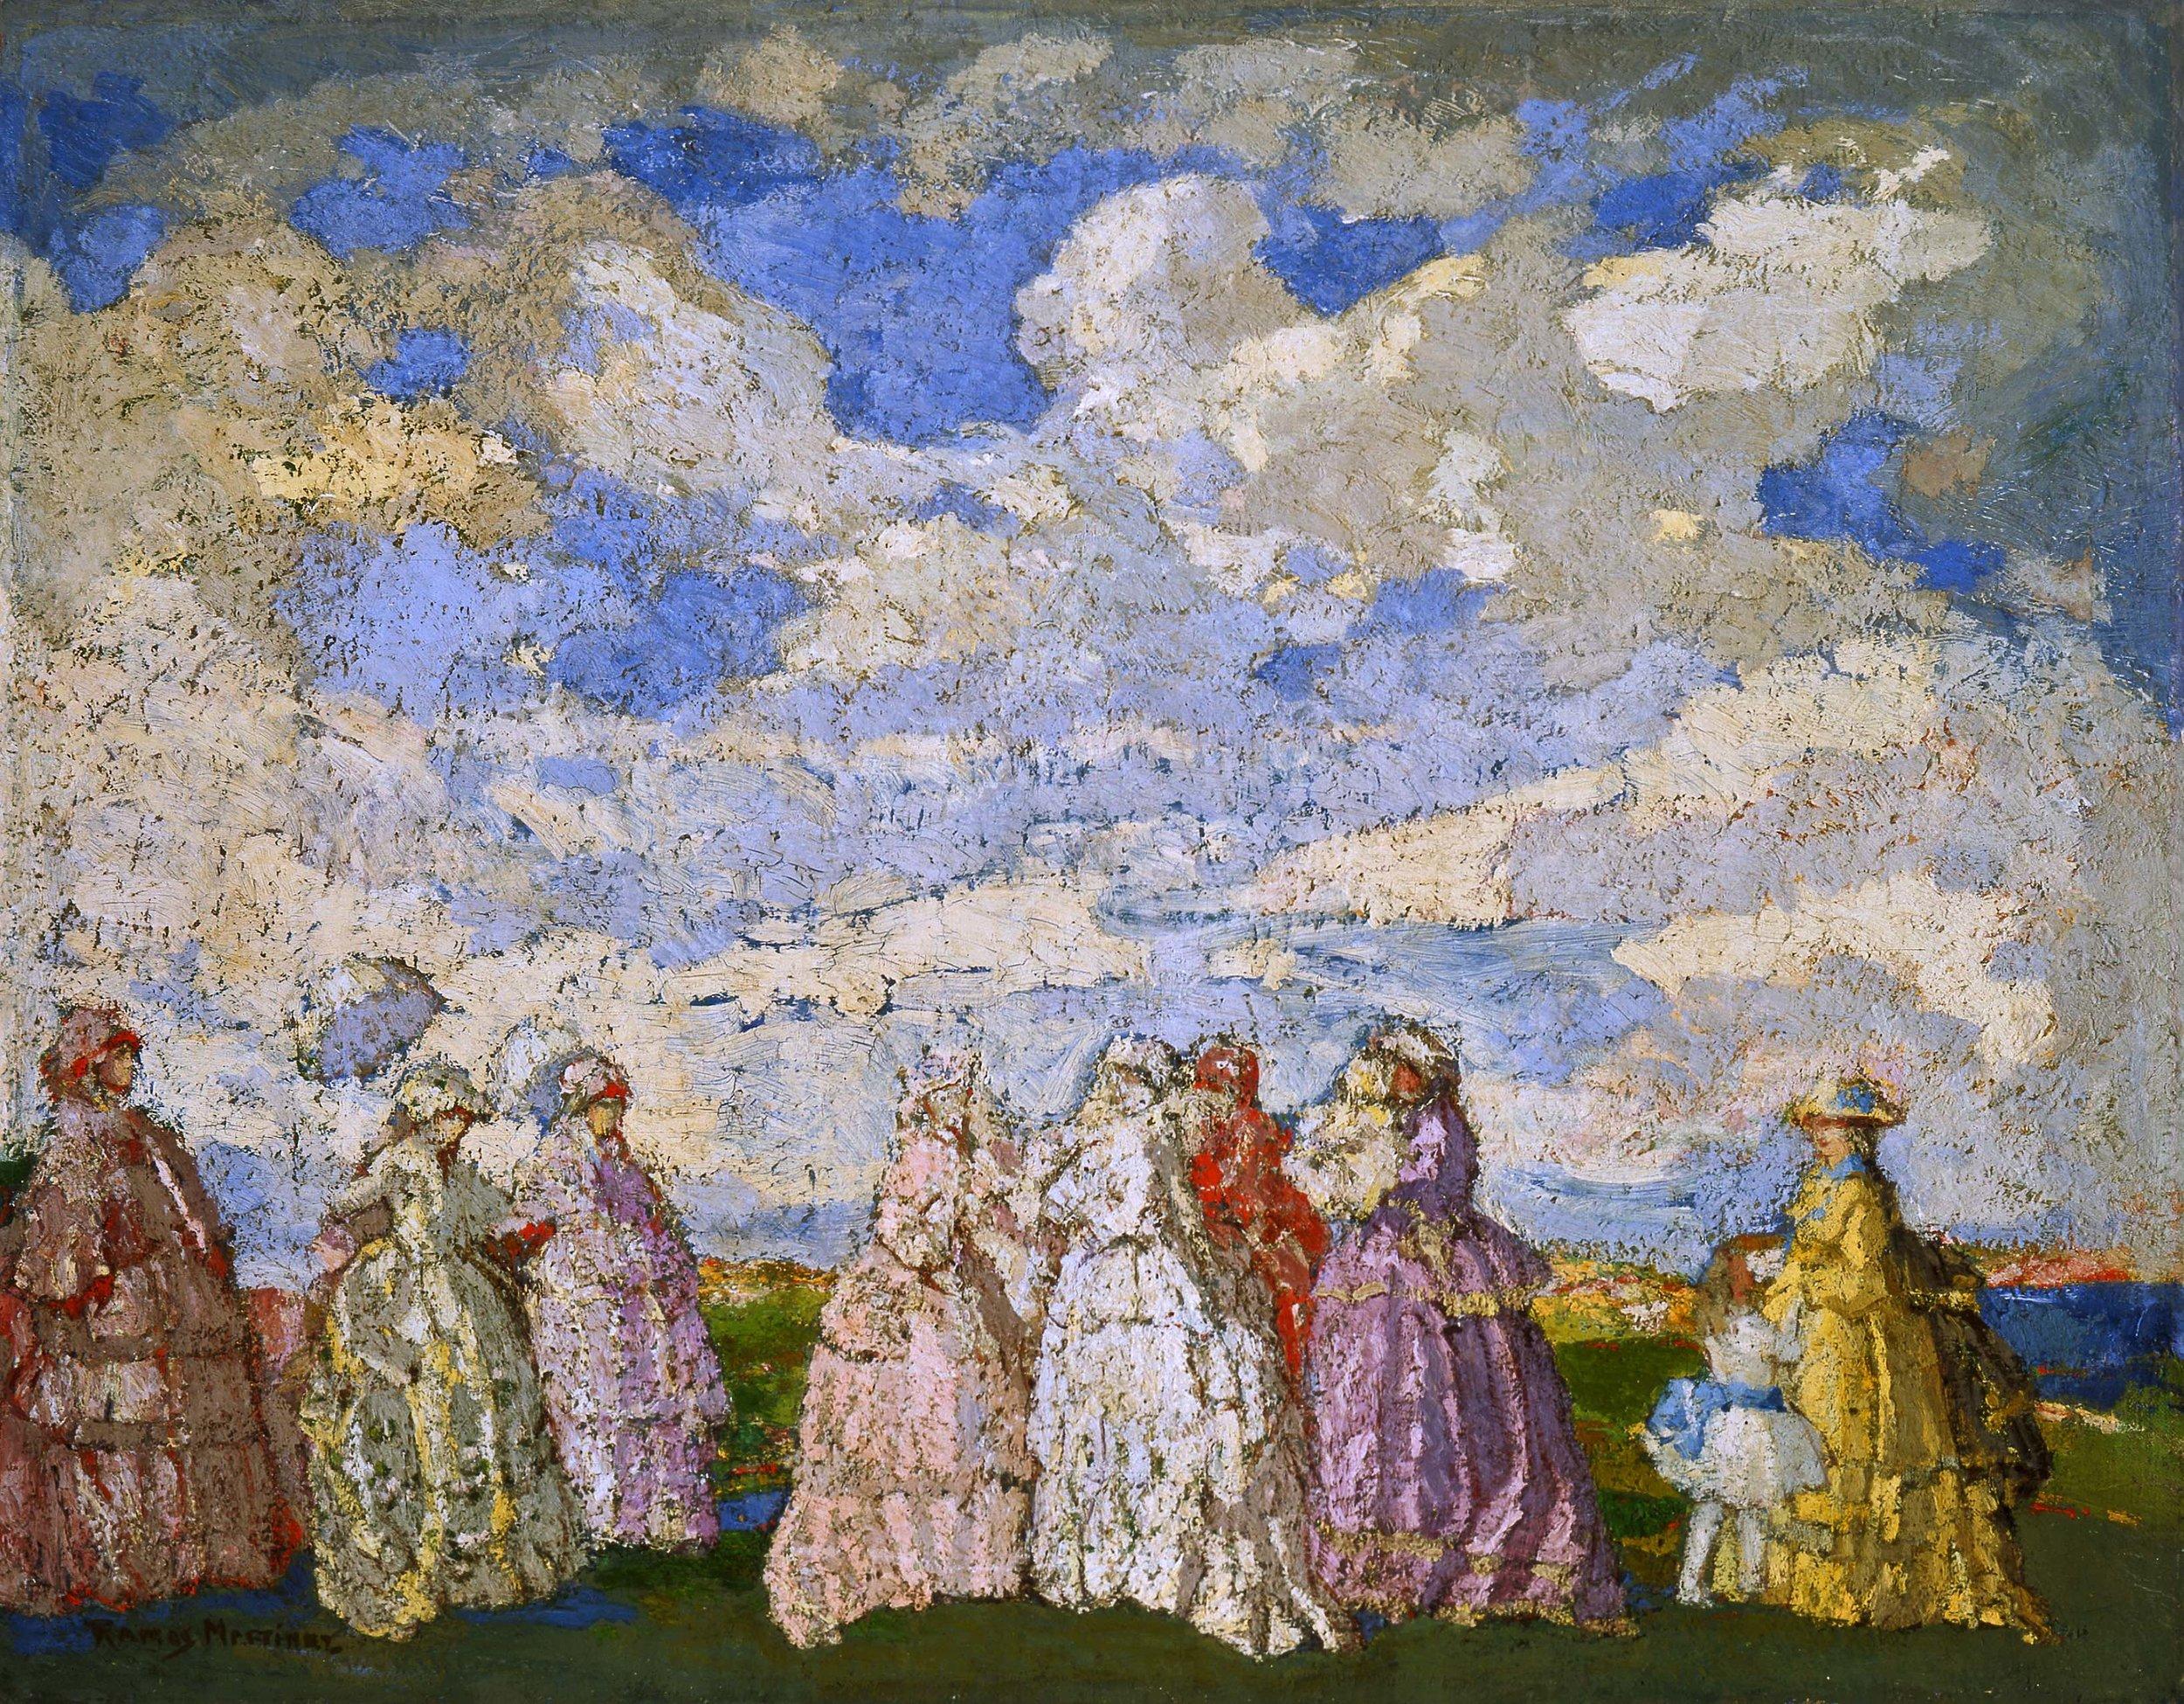 Fête Champêtre, Festival in the Countryside  ca. 1905 oil on canvas / óleo sobre tela 28.5 x 36.4 inches; 72.4 x 92.4 centímetros Museo Andres Blaisten